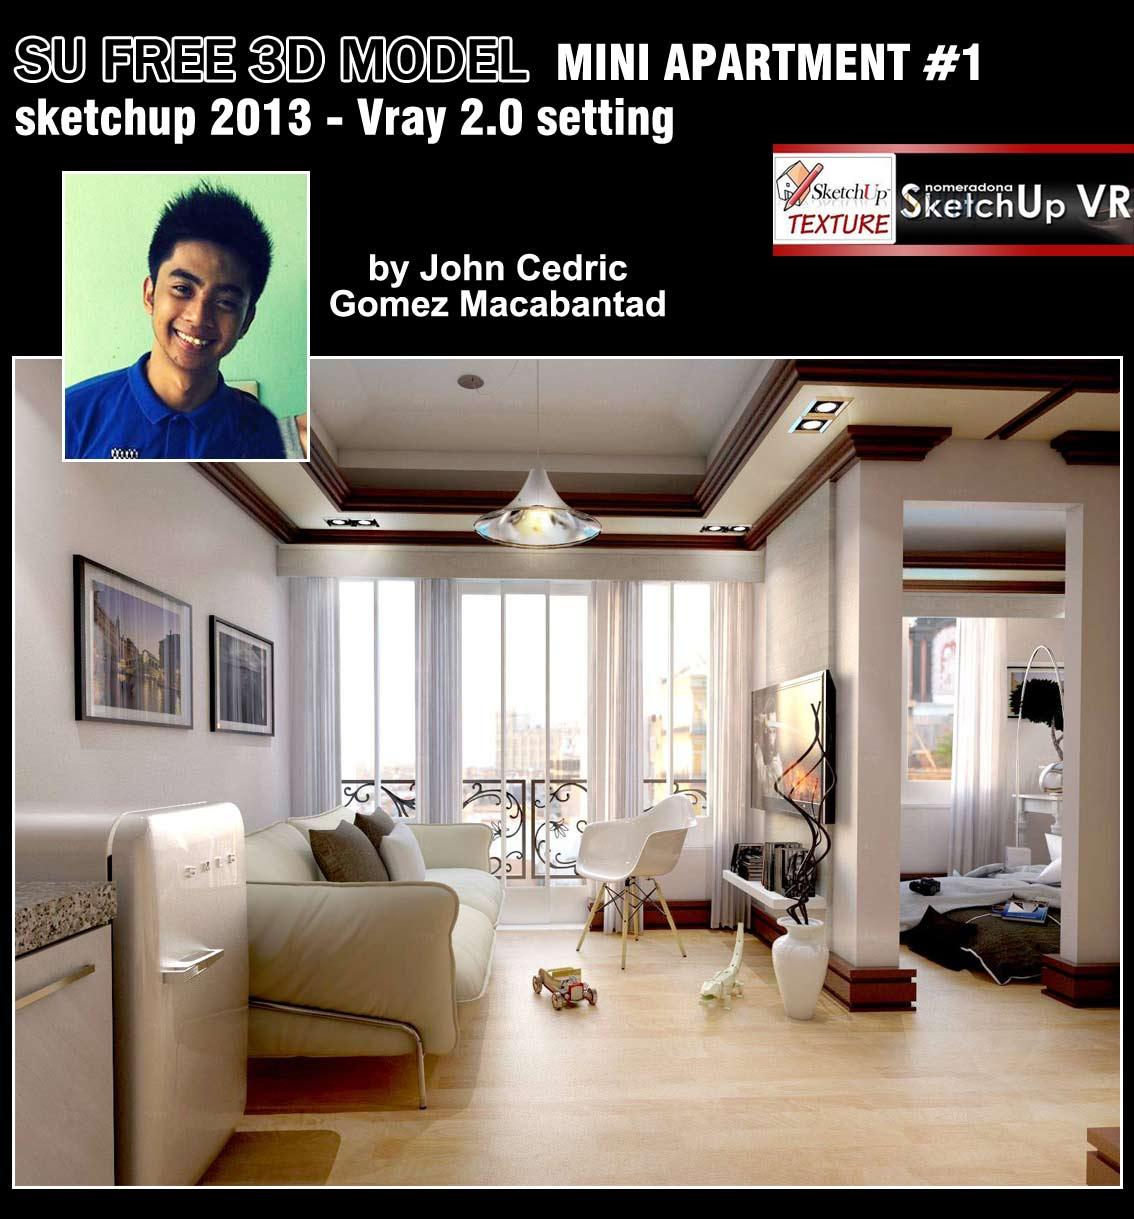 Sketchup texture sketchup model bedroom for Apartment mini model